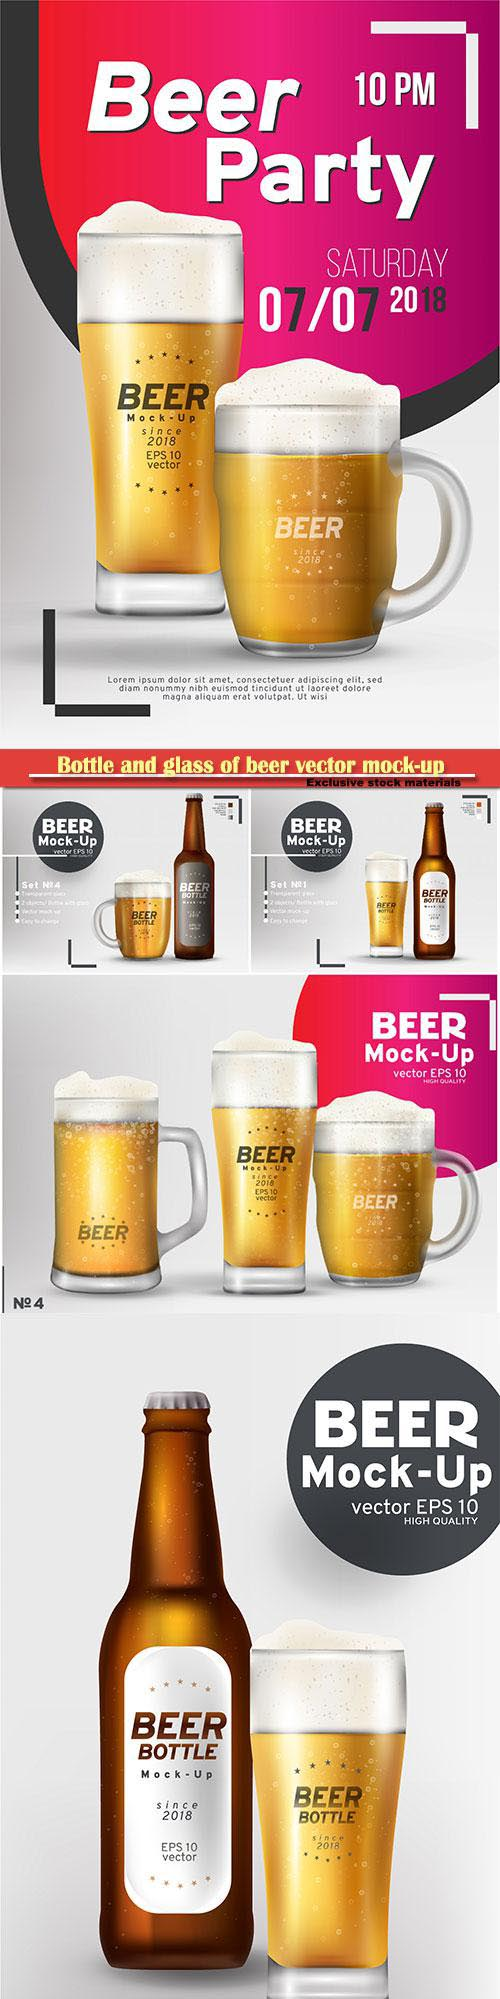 Bottle and glass of beer vector mock-up set